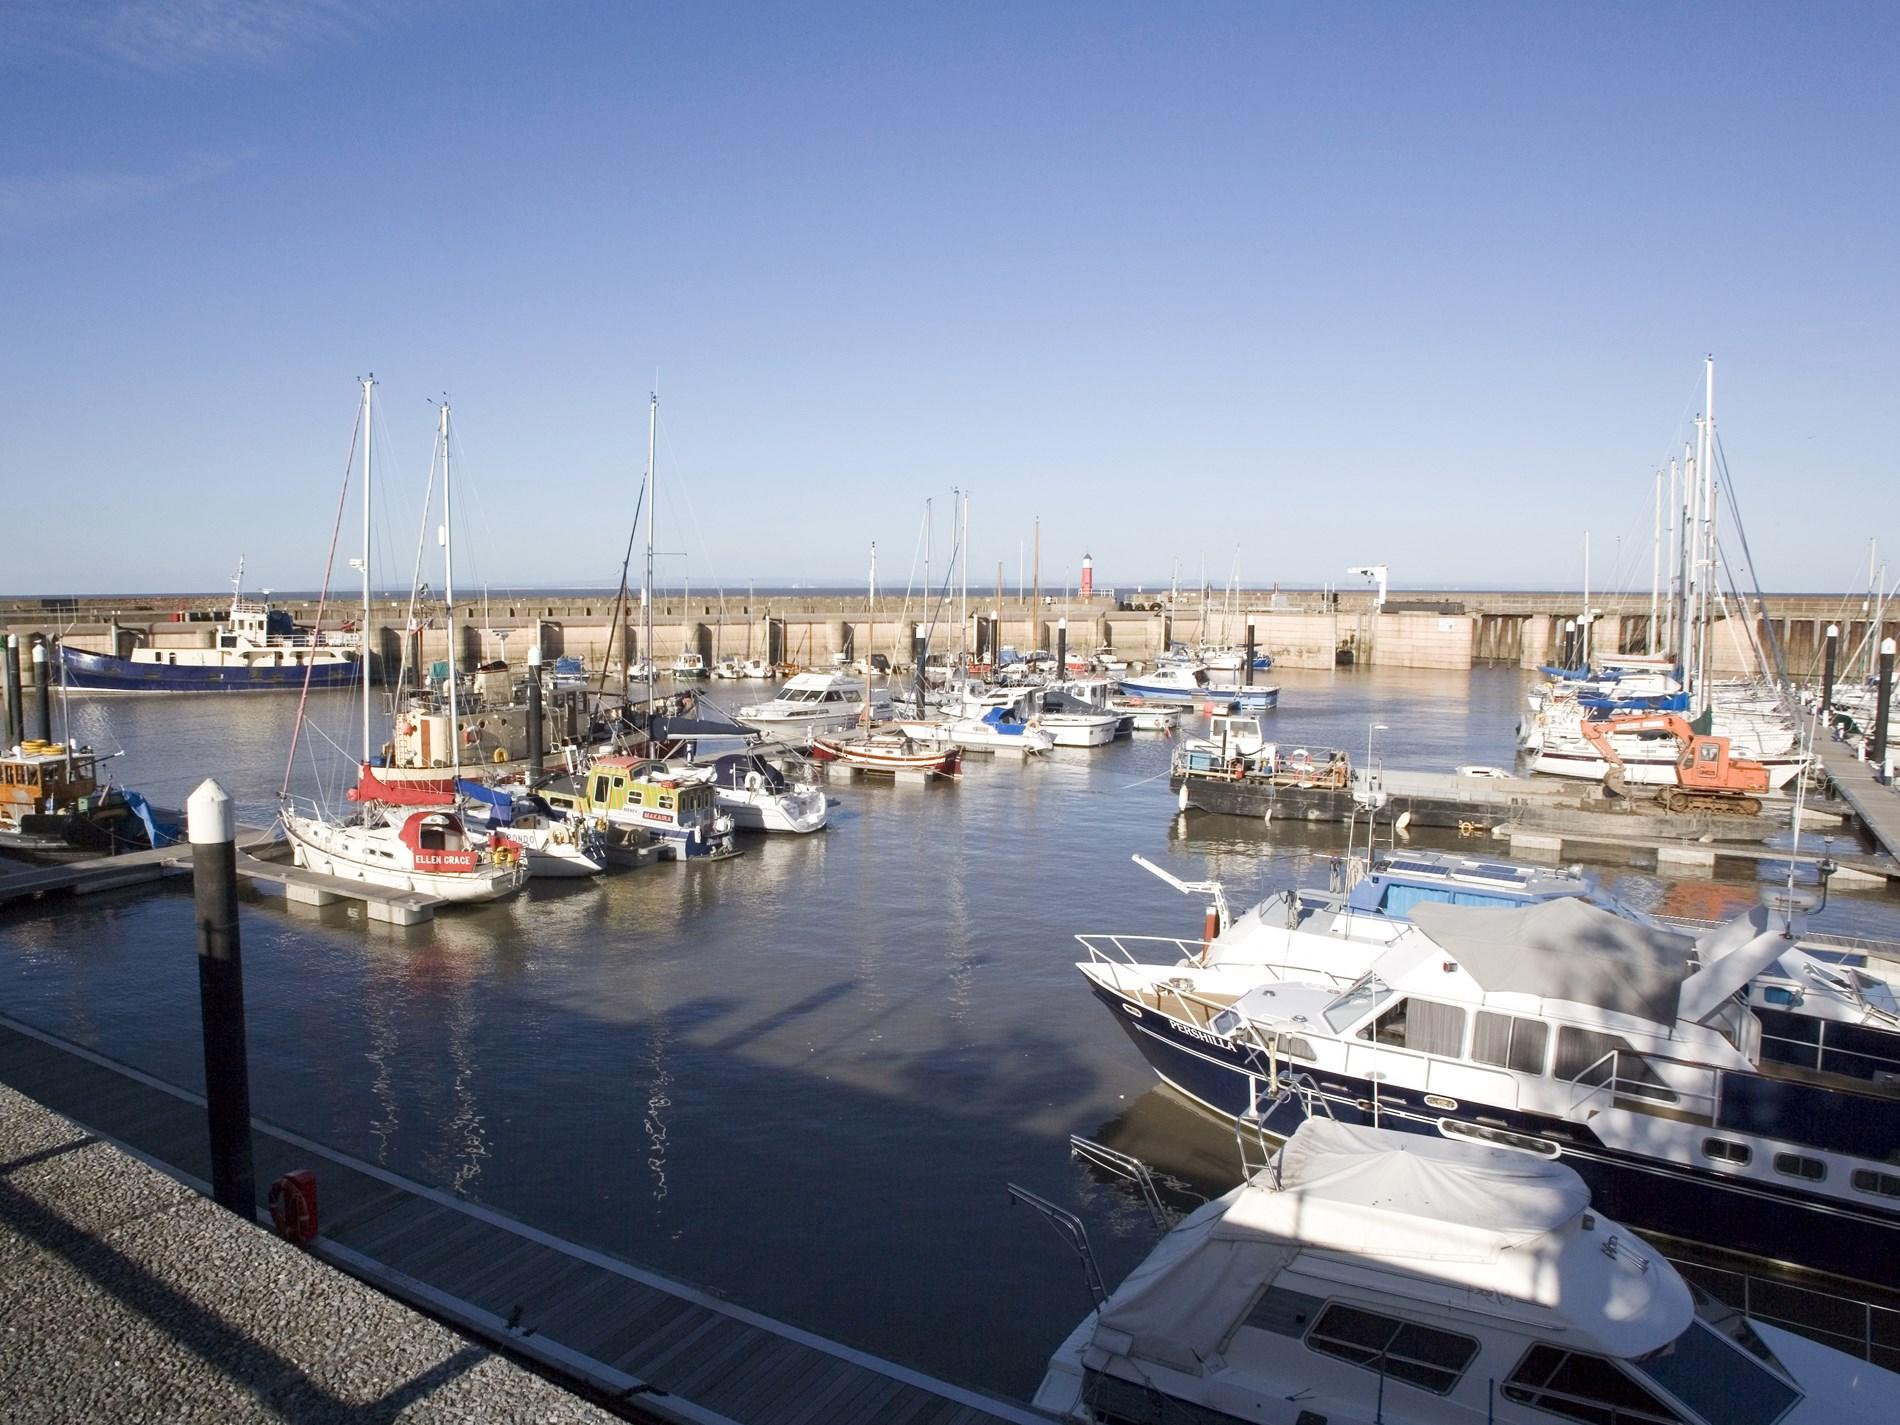 A short walk to Watchet marina